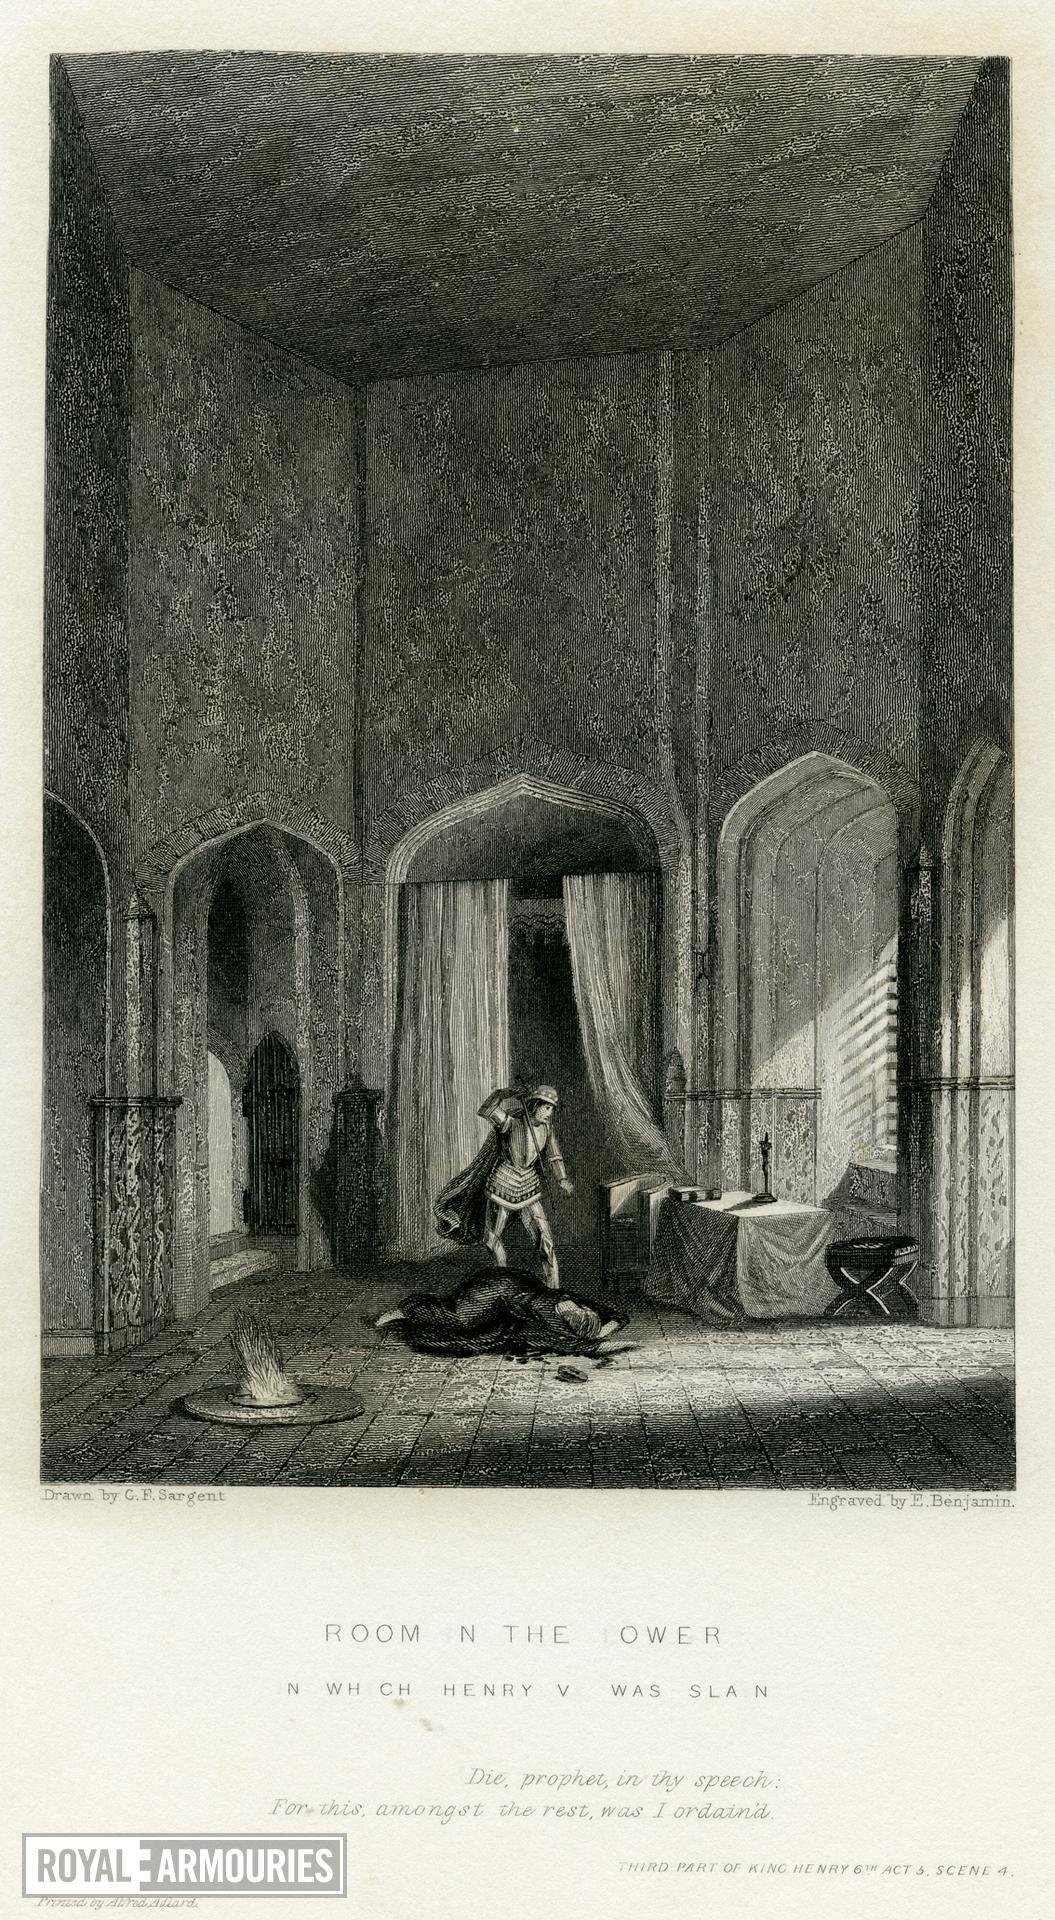 Henry VI's Room